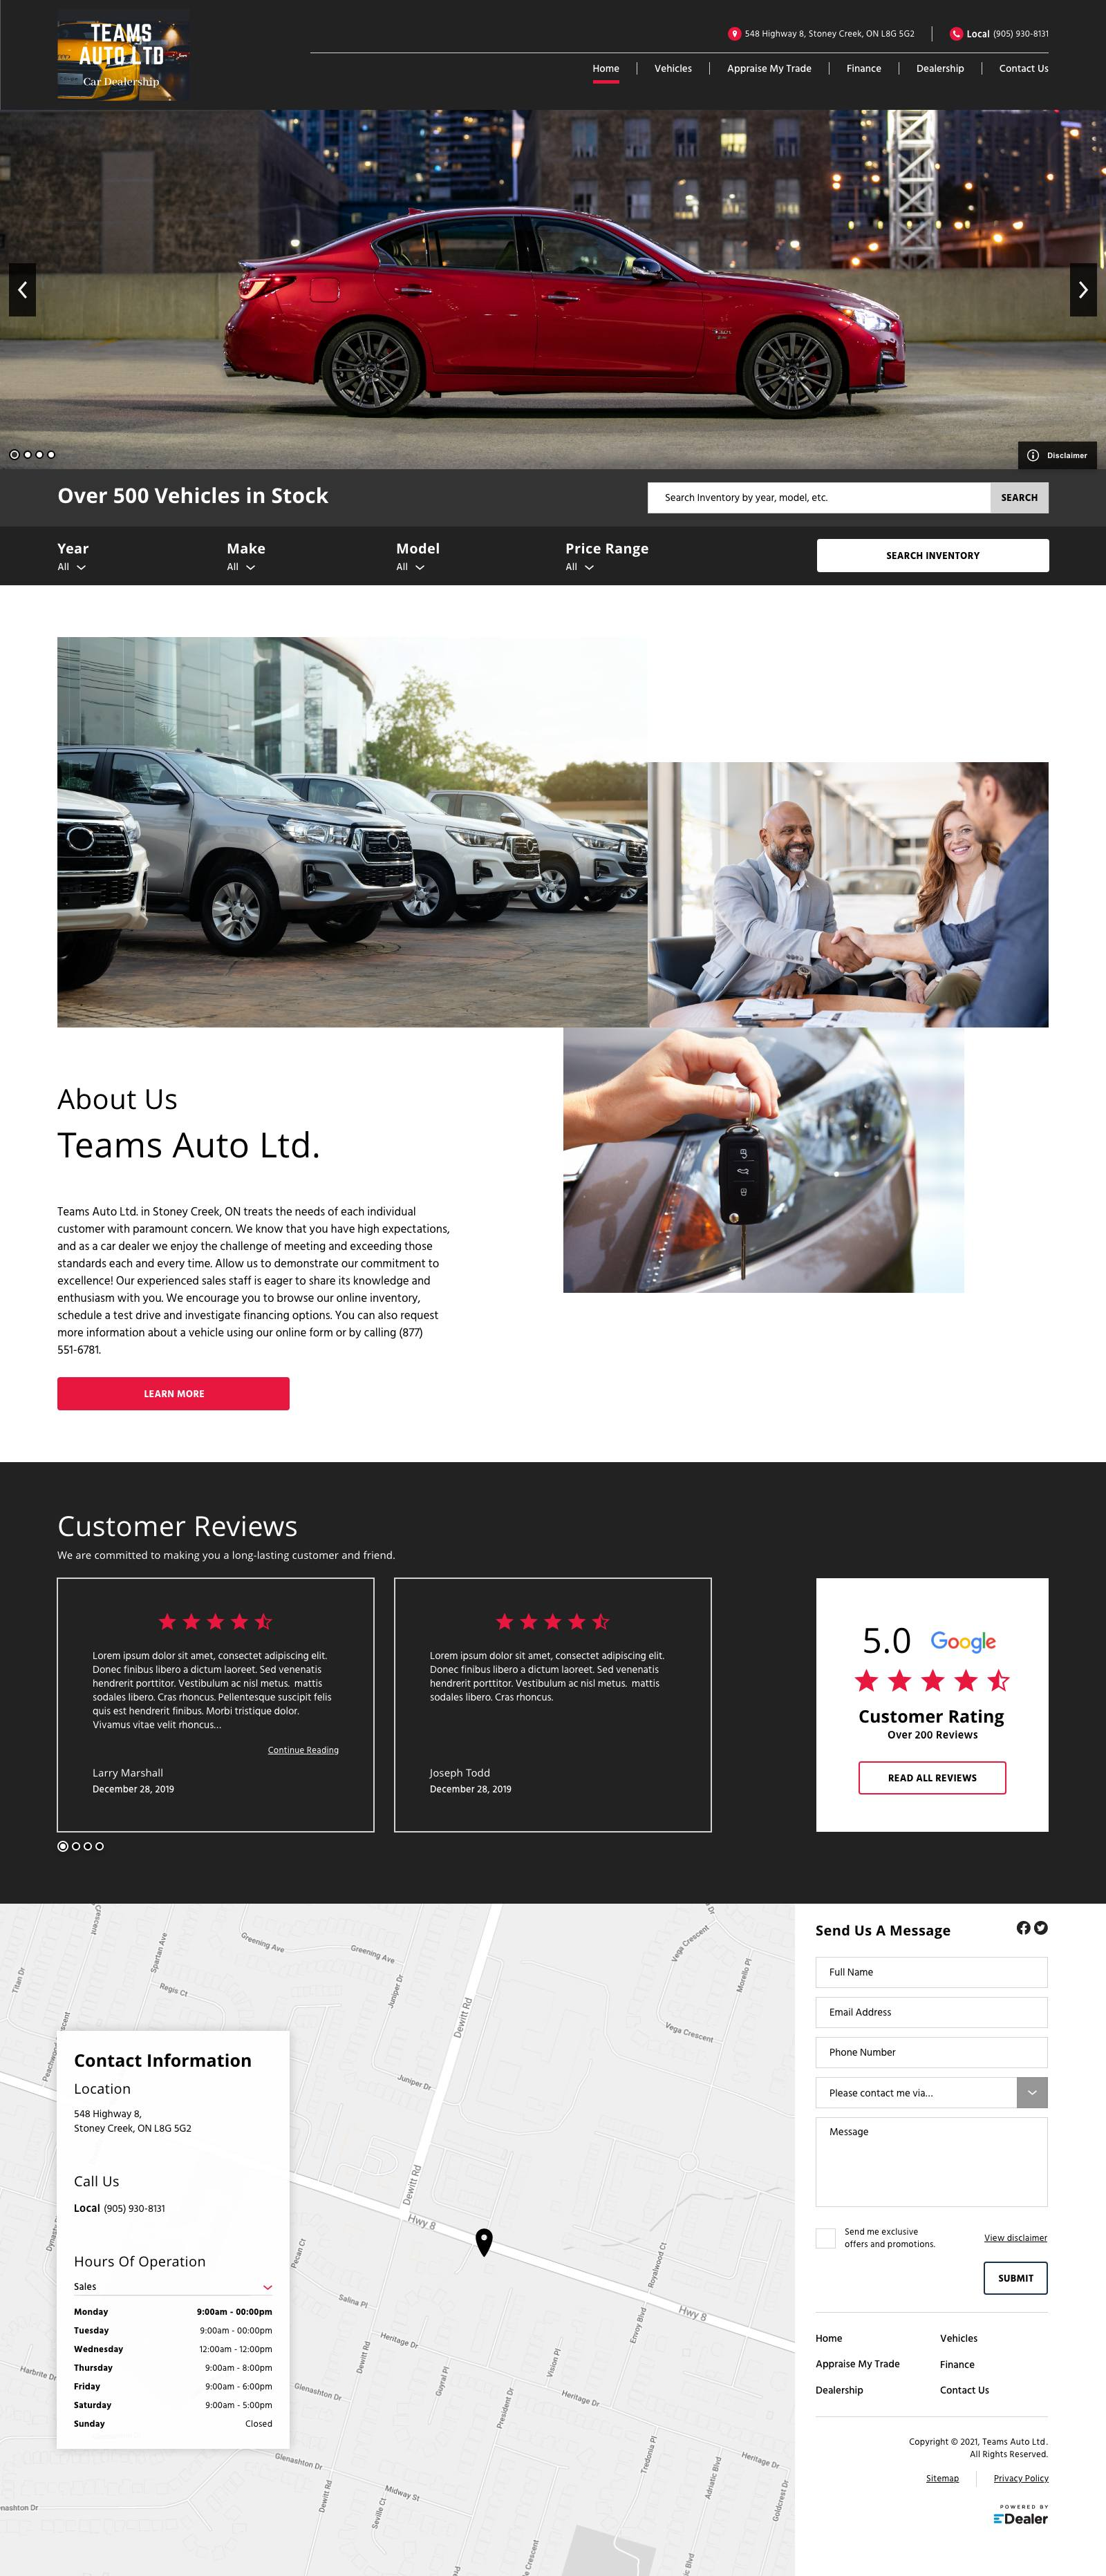 Teams Auto Ltd